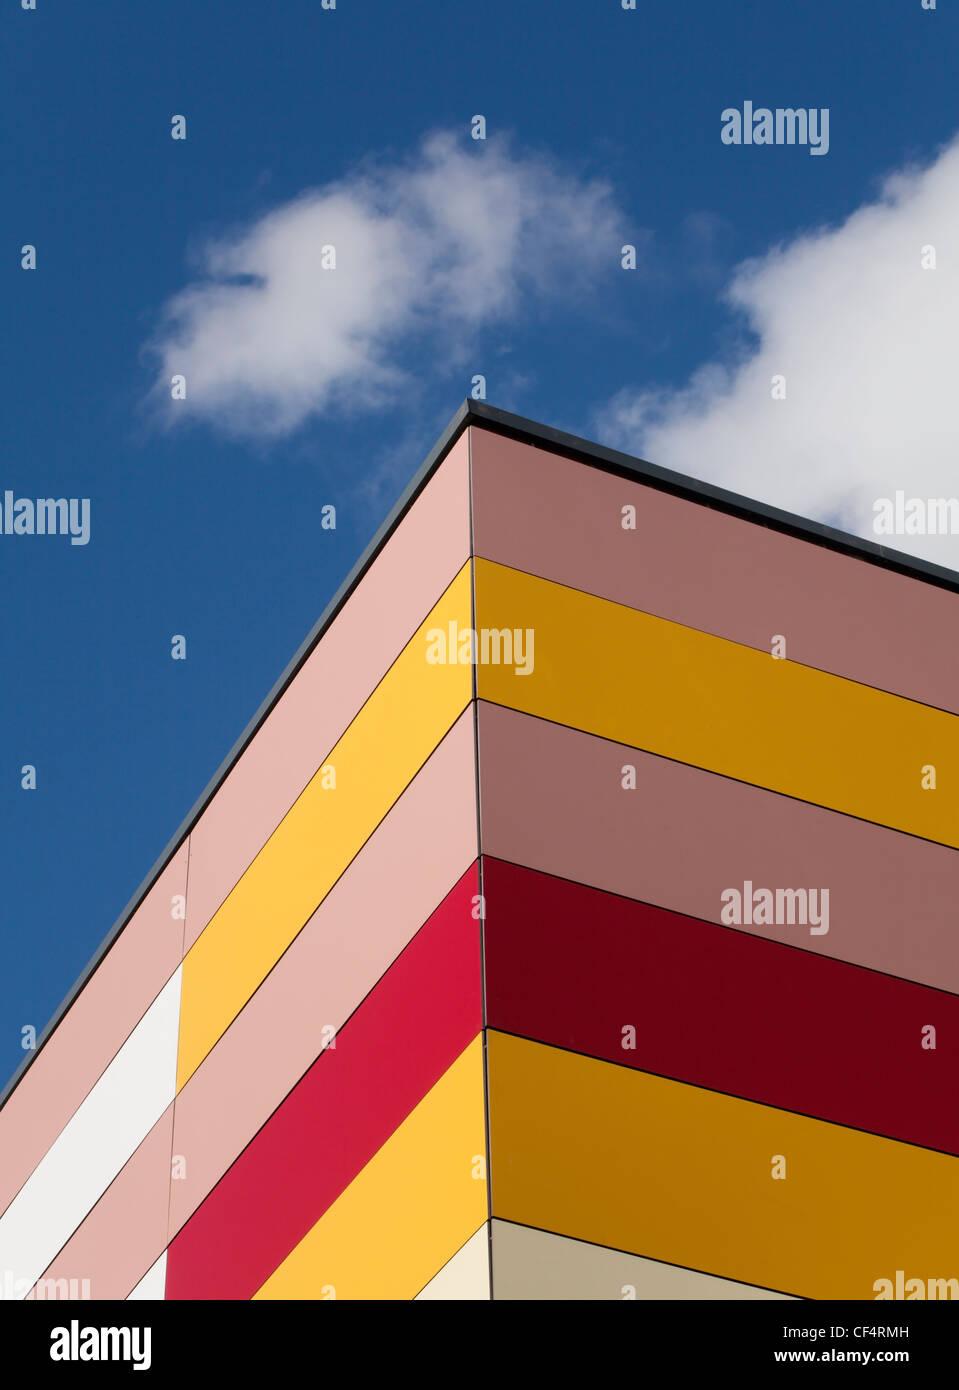 Colorido exterior de un edificio en Durham Johnston Escuela. Imagen De Stock